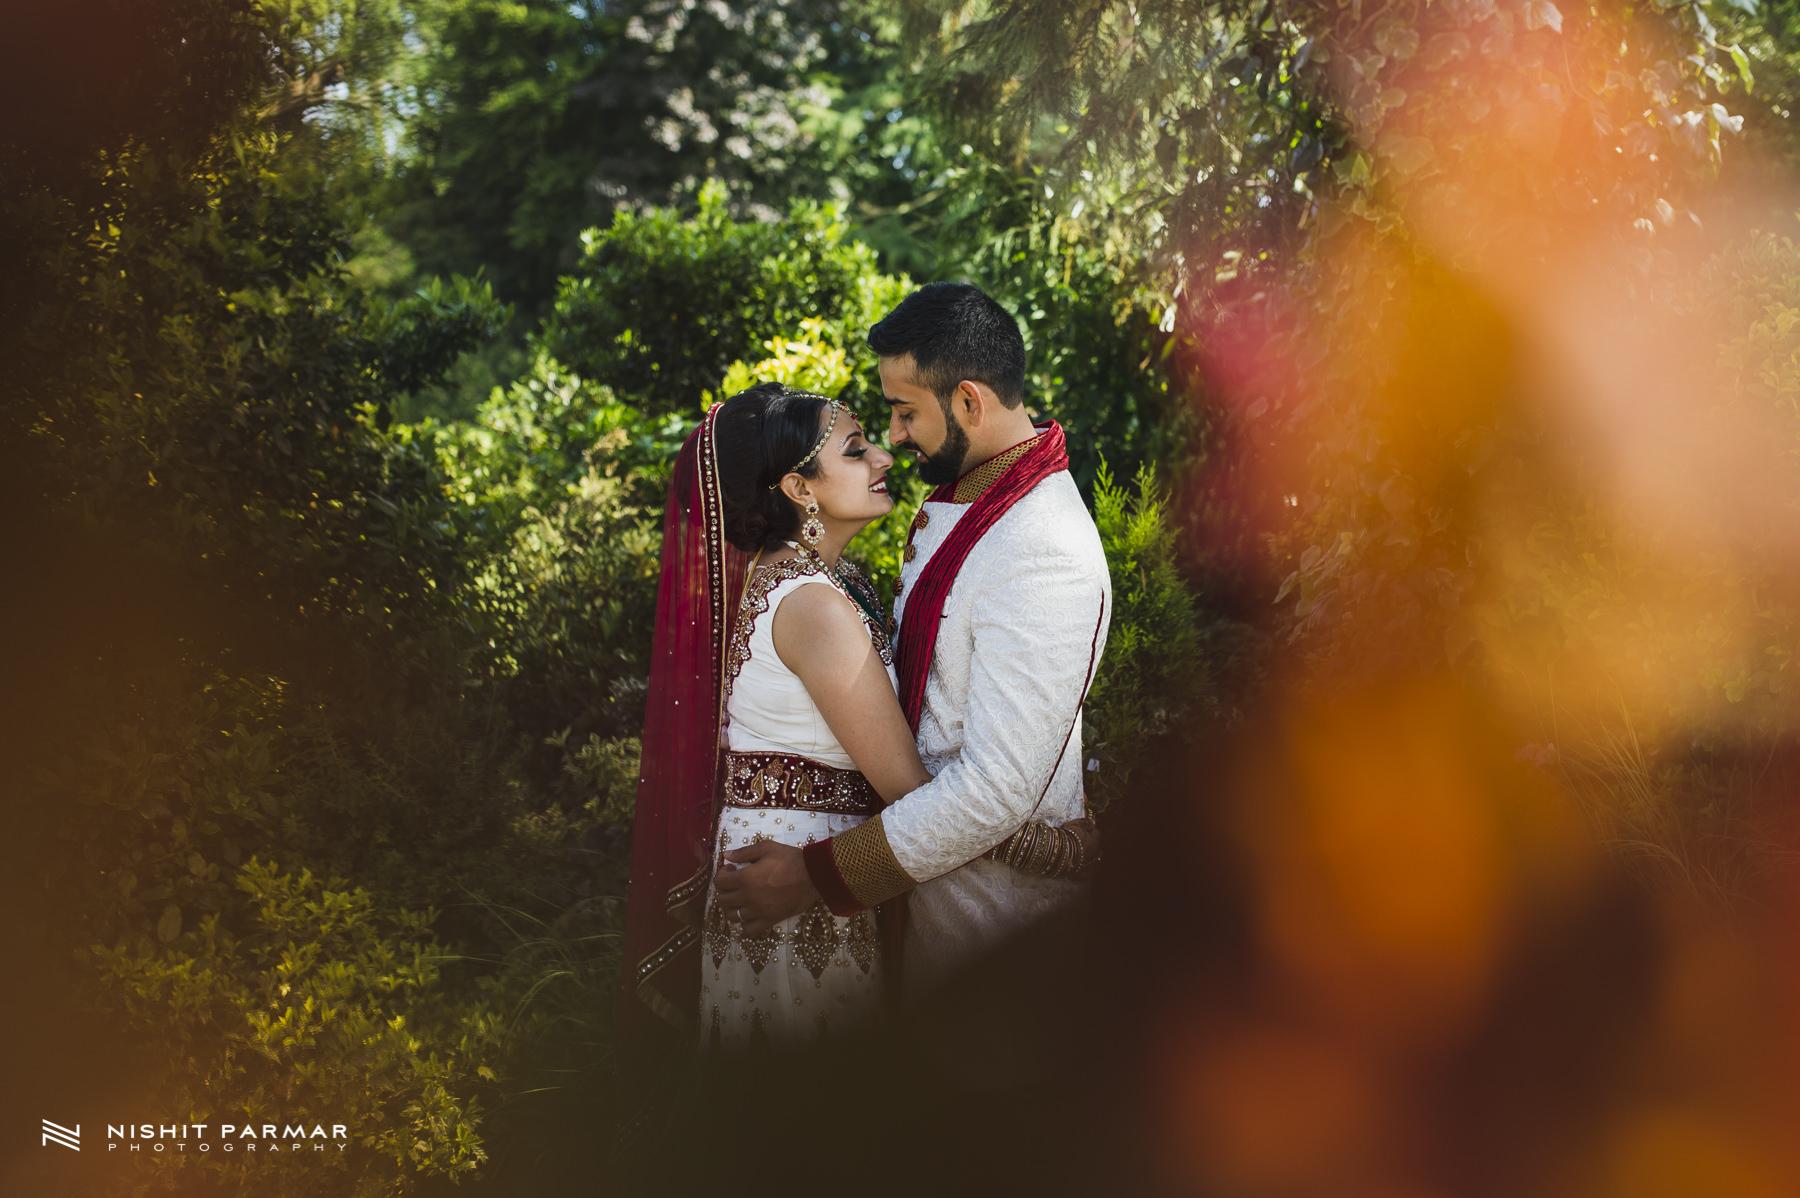 Hare Krishna Wedding - Bhaktivedanta Manor Temple - Indian Weddding - Asian Wedding - Hindu Wedding - Watford-31